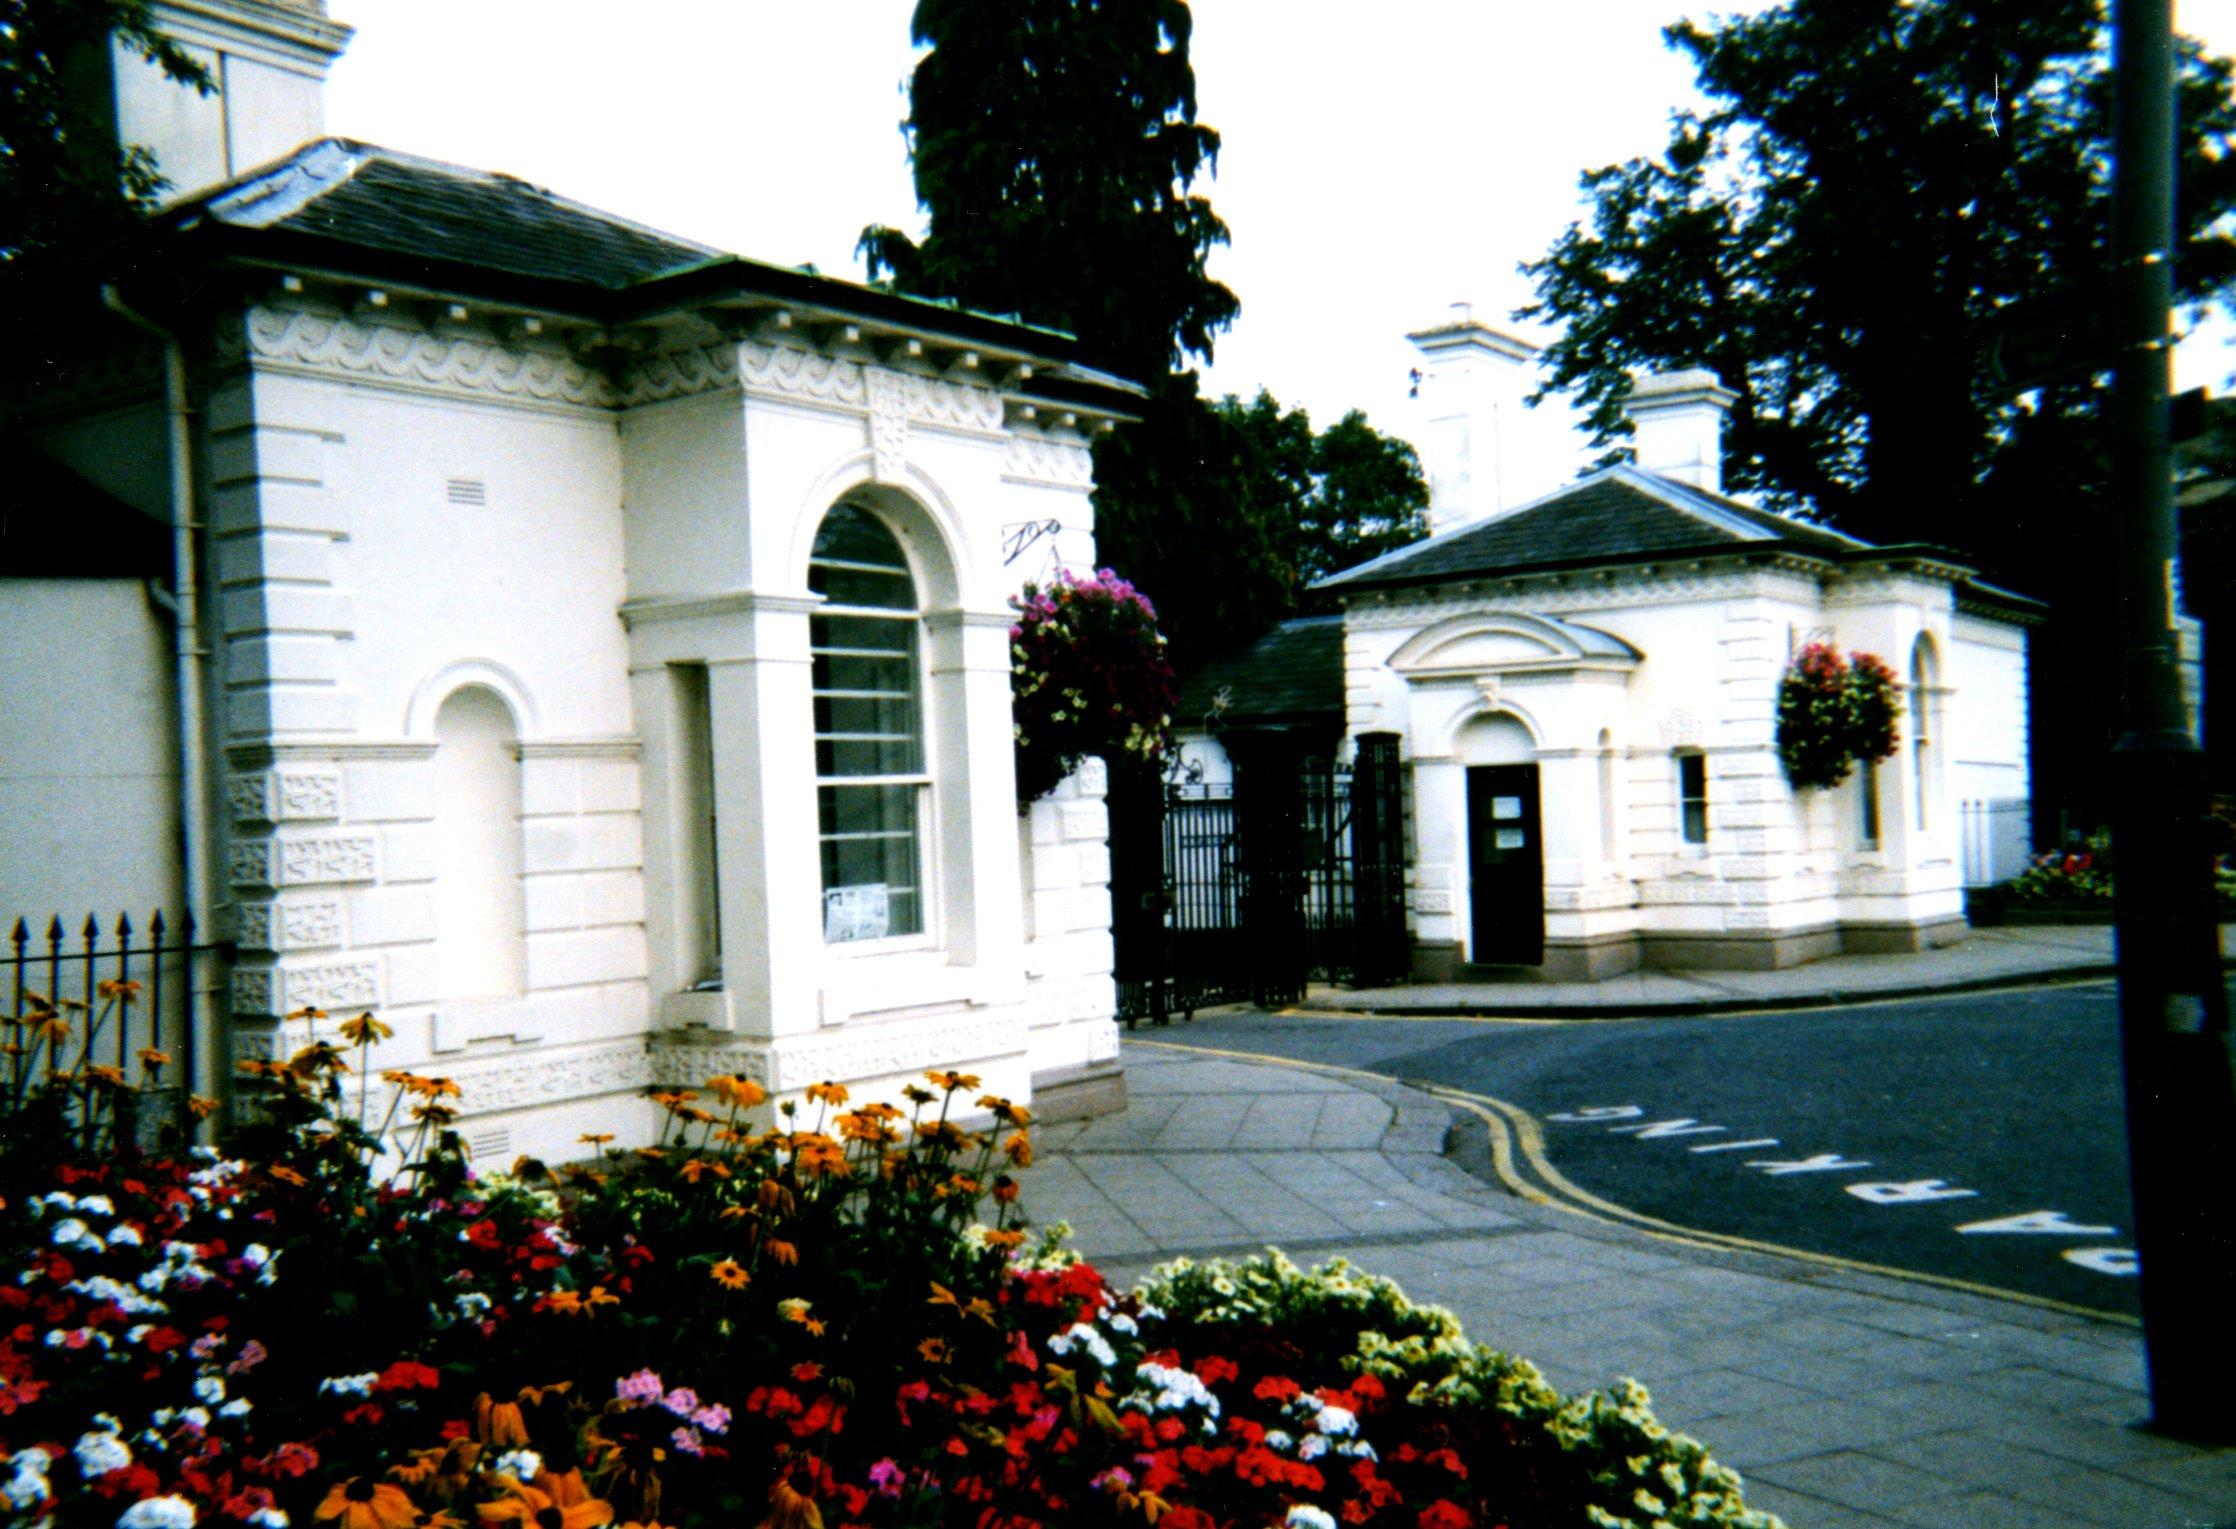 The Lodges, Jephson Gardens